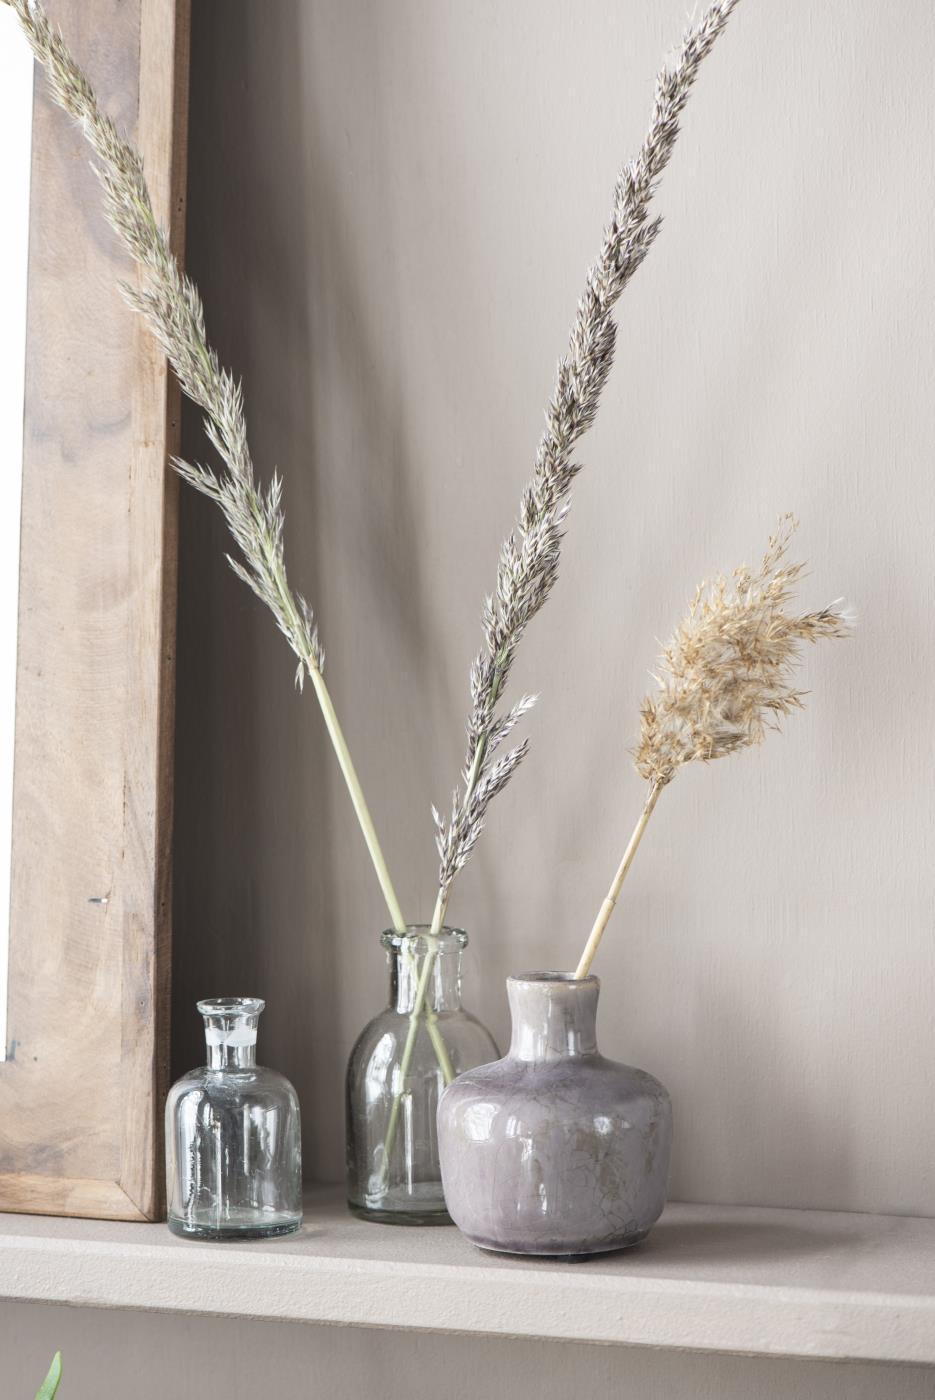 Vase mit krakelige Oberfläche